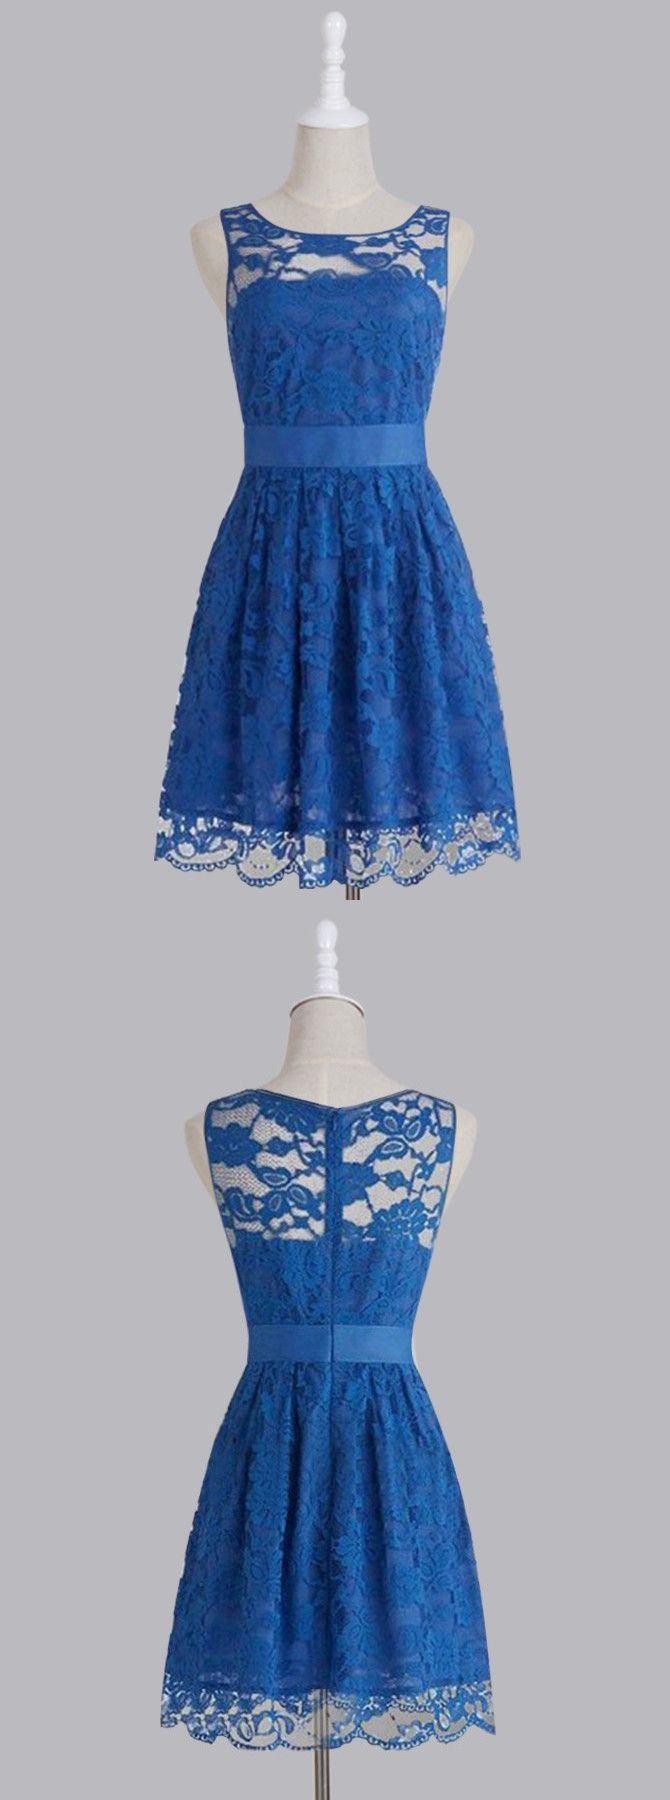 Bridesmaid dressesshort bridesmaid dressescheap bridesmaid bridesmaid dressesshort bridesmaid dressescheap bridesmaid dressesroyal blue bridesmaid dresses ombrellifo Choice Image